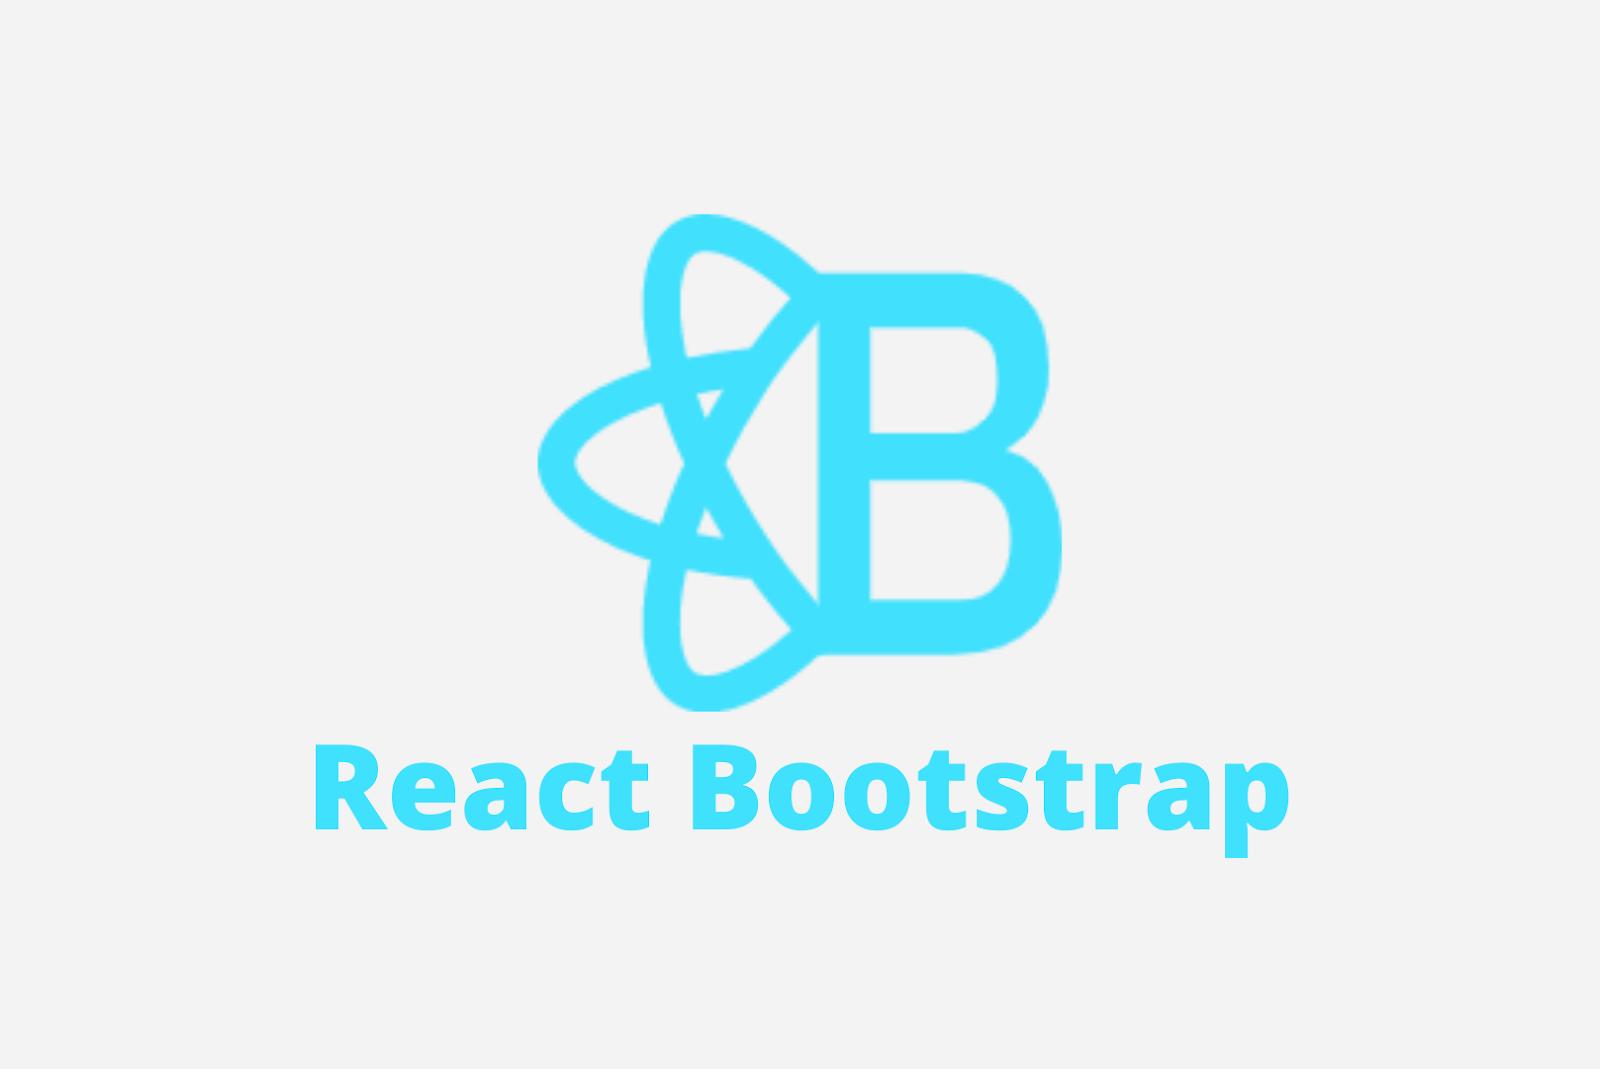 React Bootstrap React Libraries 2020